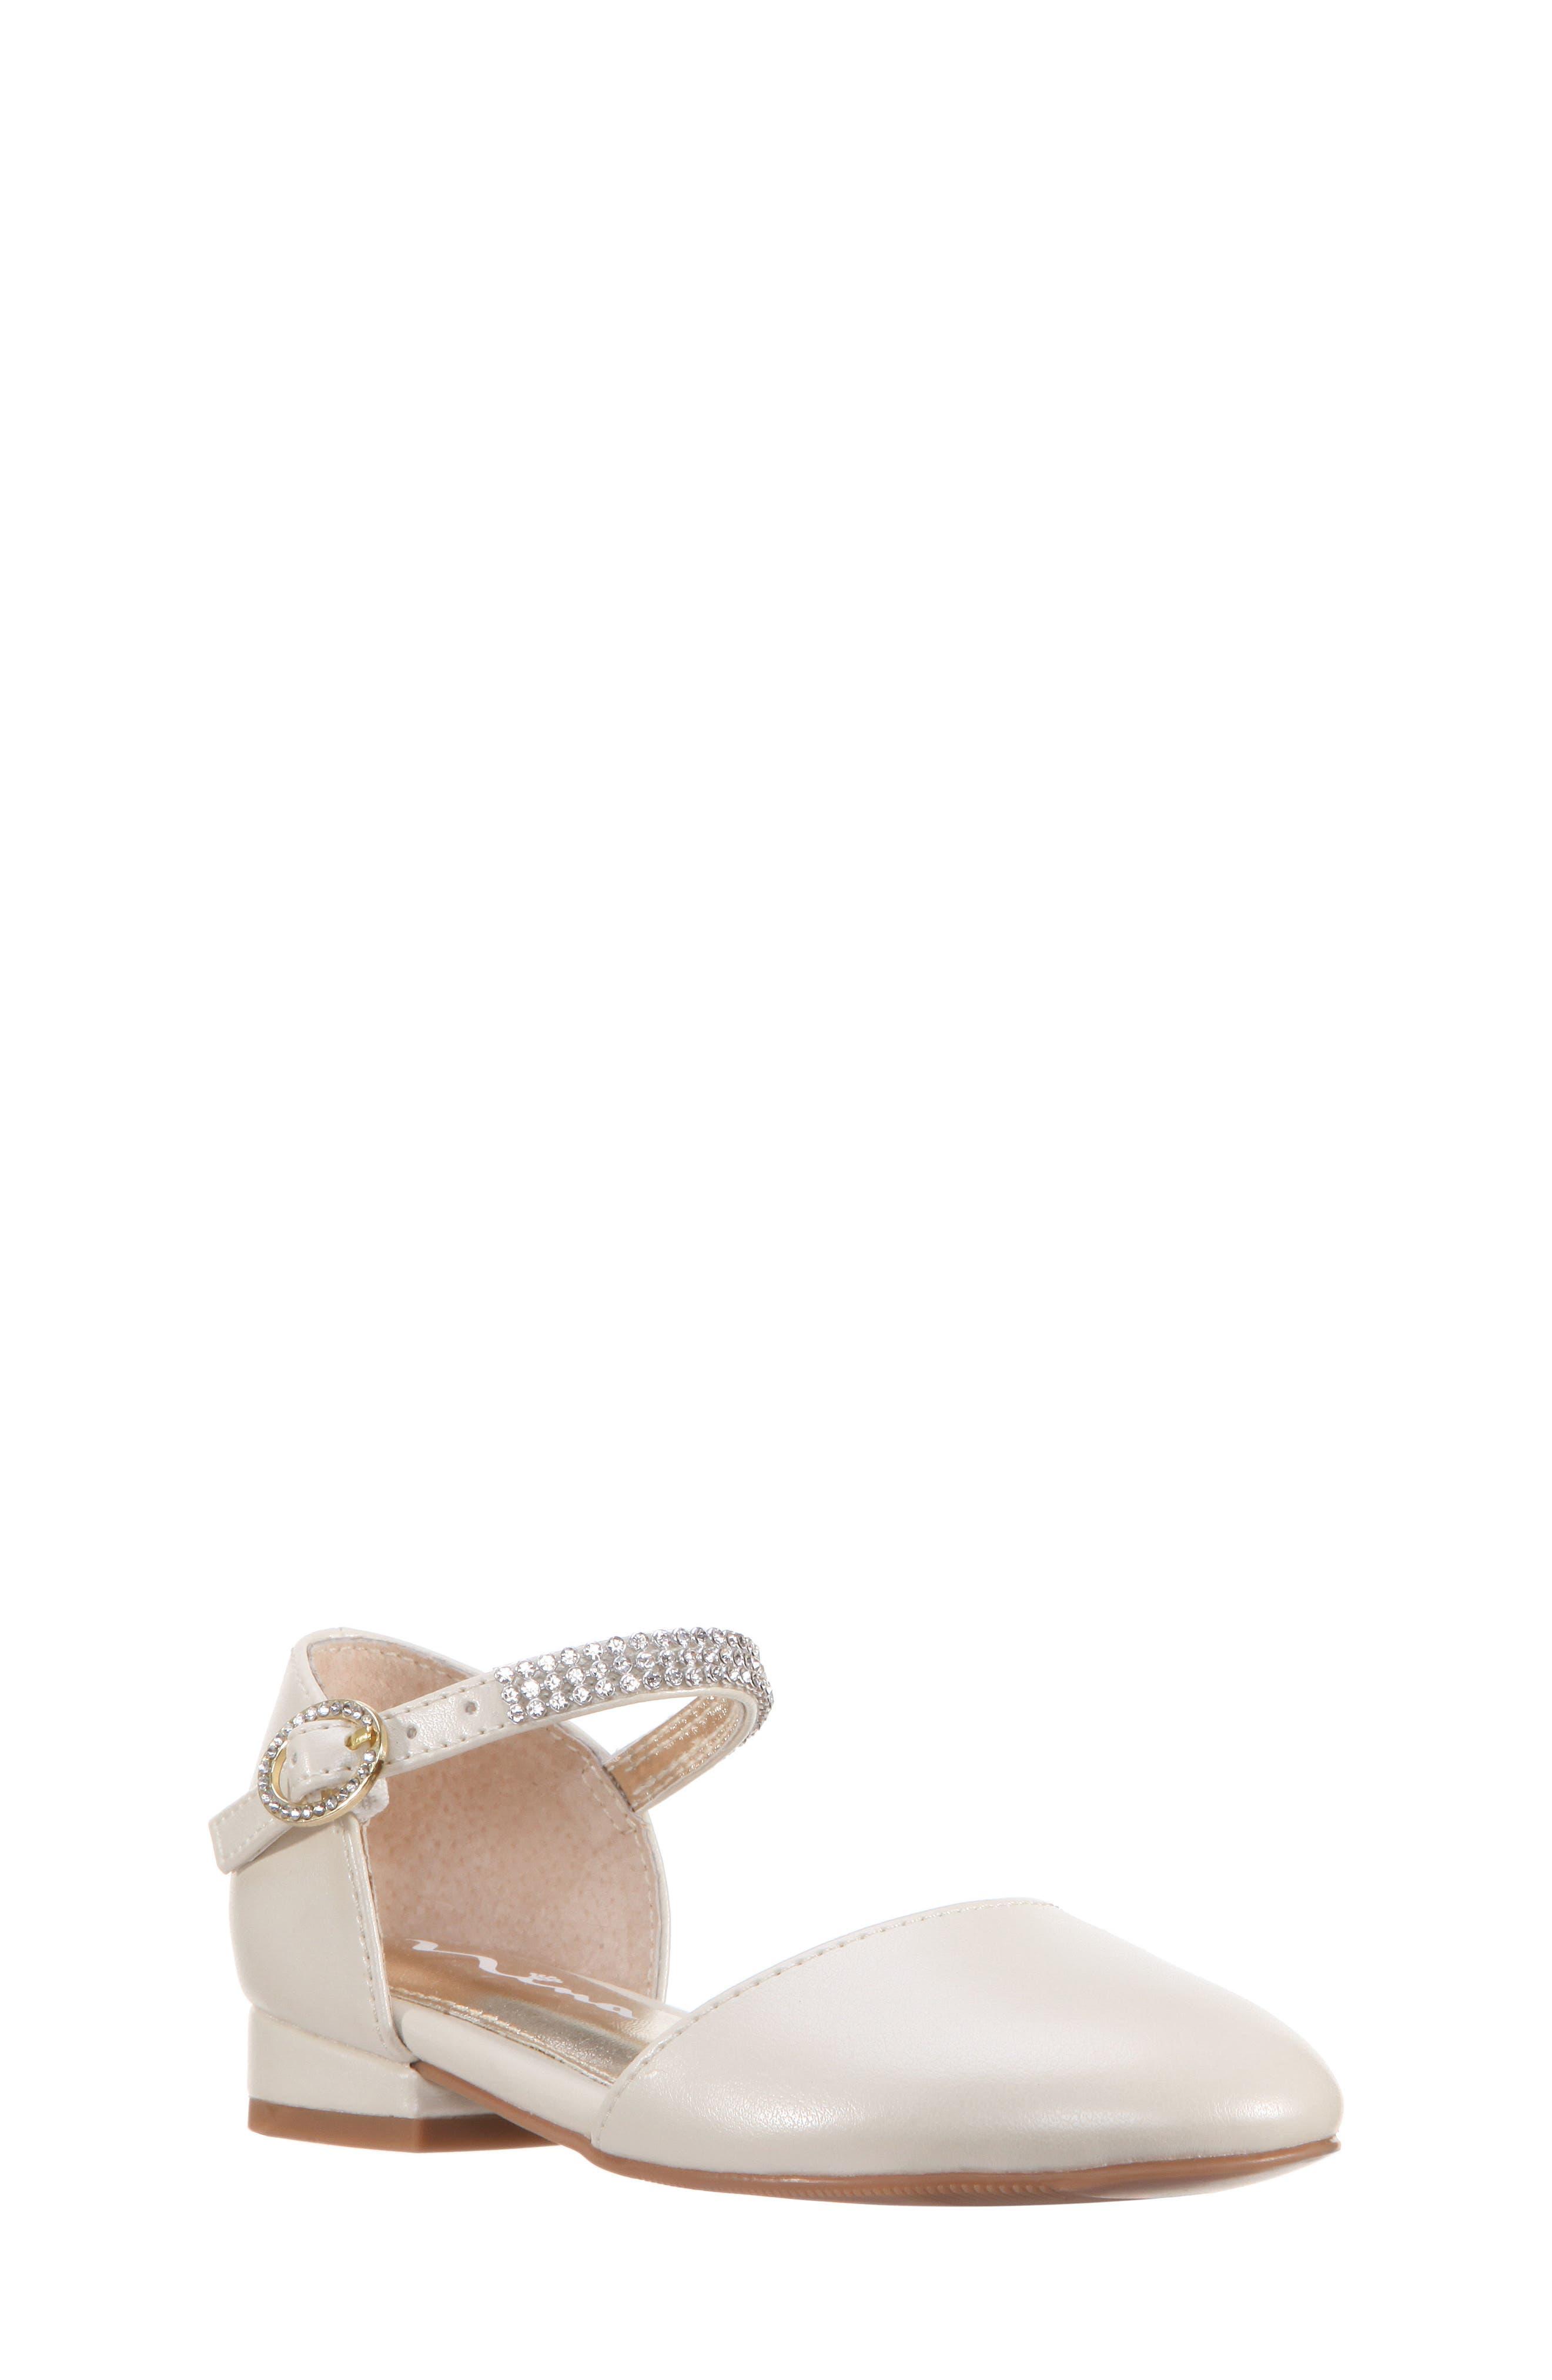 Cara Crystal Embellished d'Orsay Sandal,                             Main thumbnail 1, color,                             Bone Pearlized